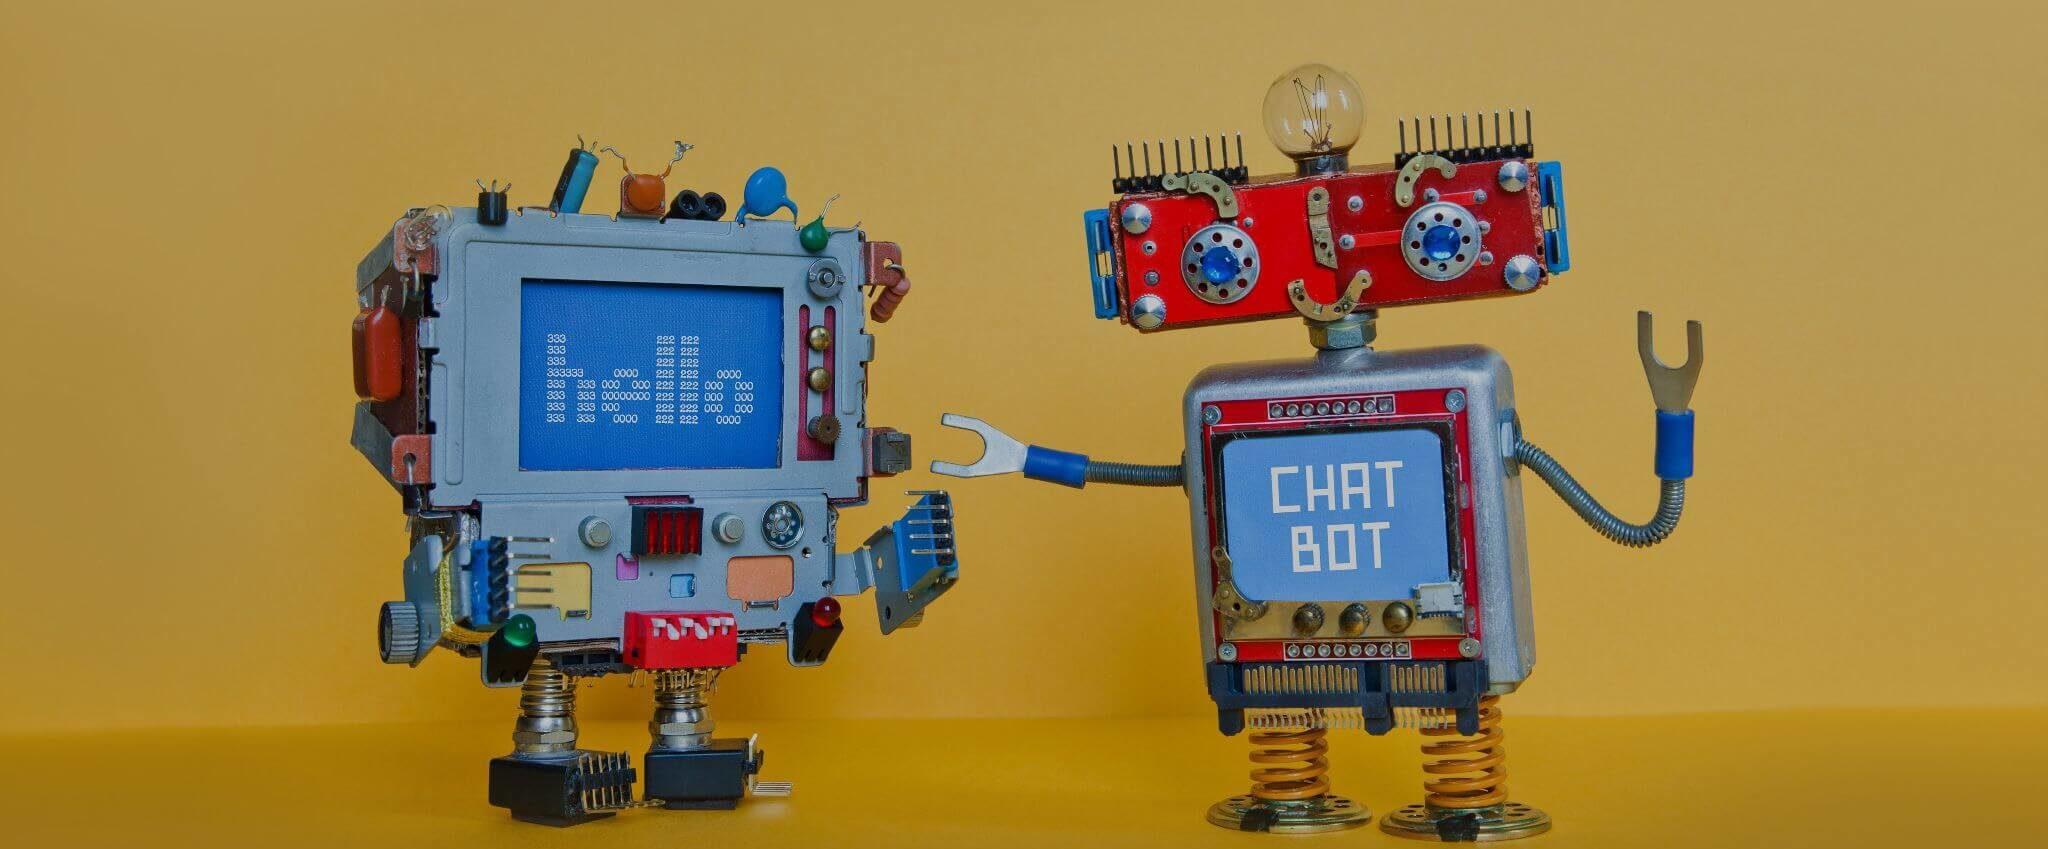 ideas de negocios online de chatbot